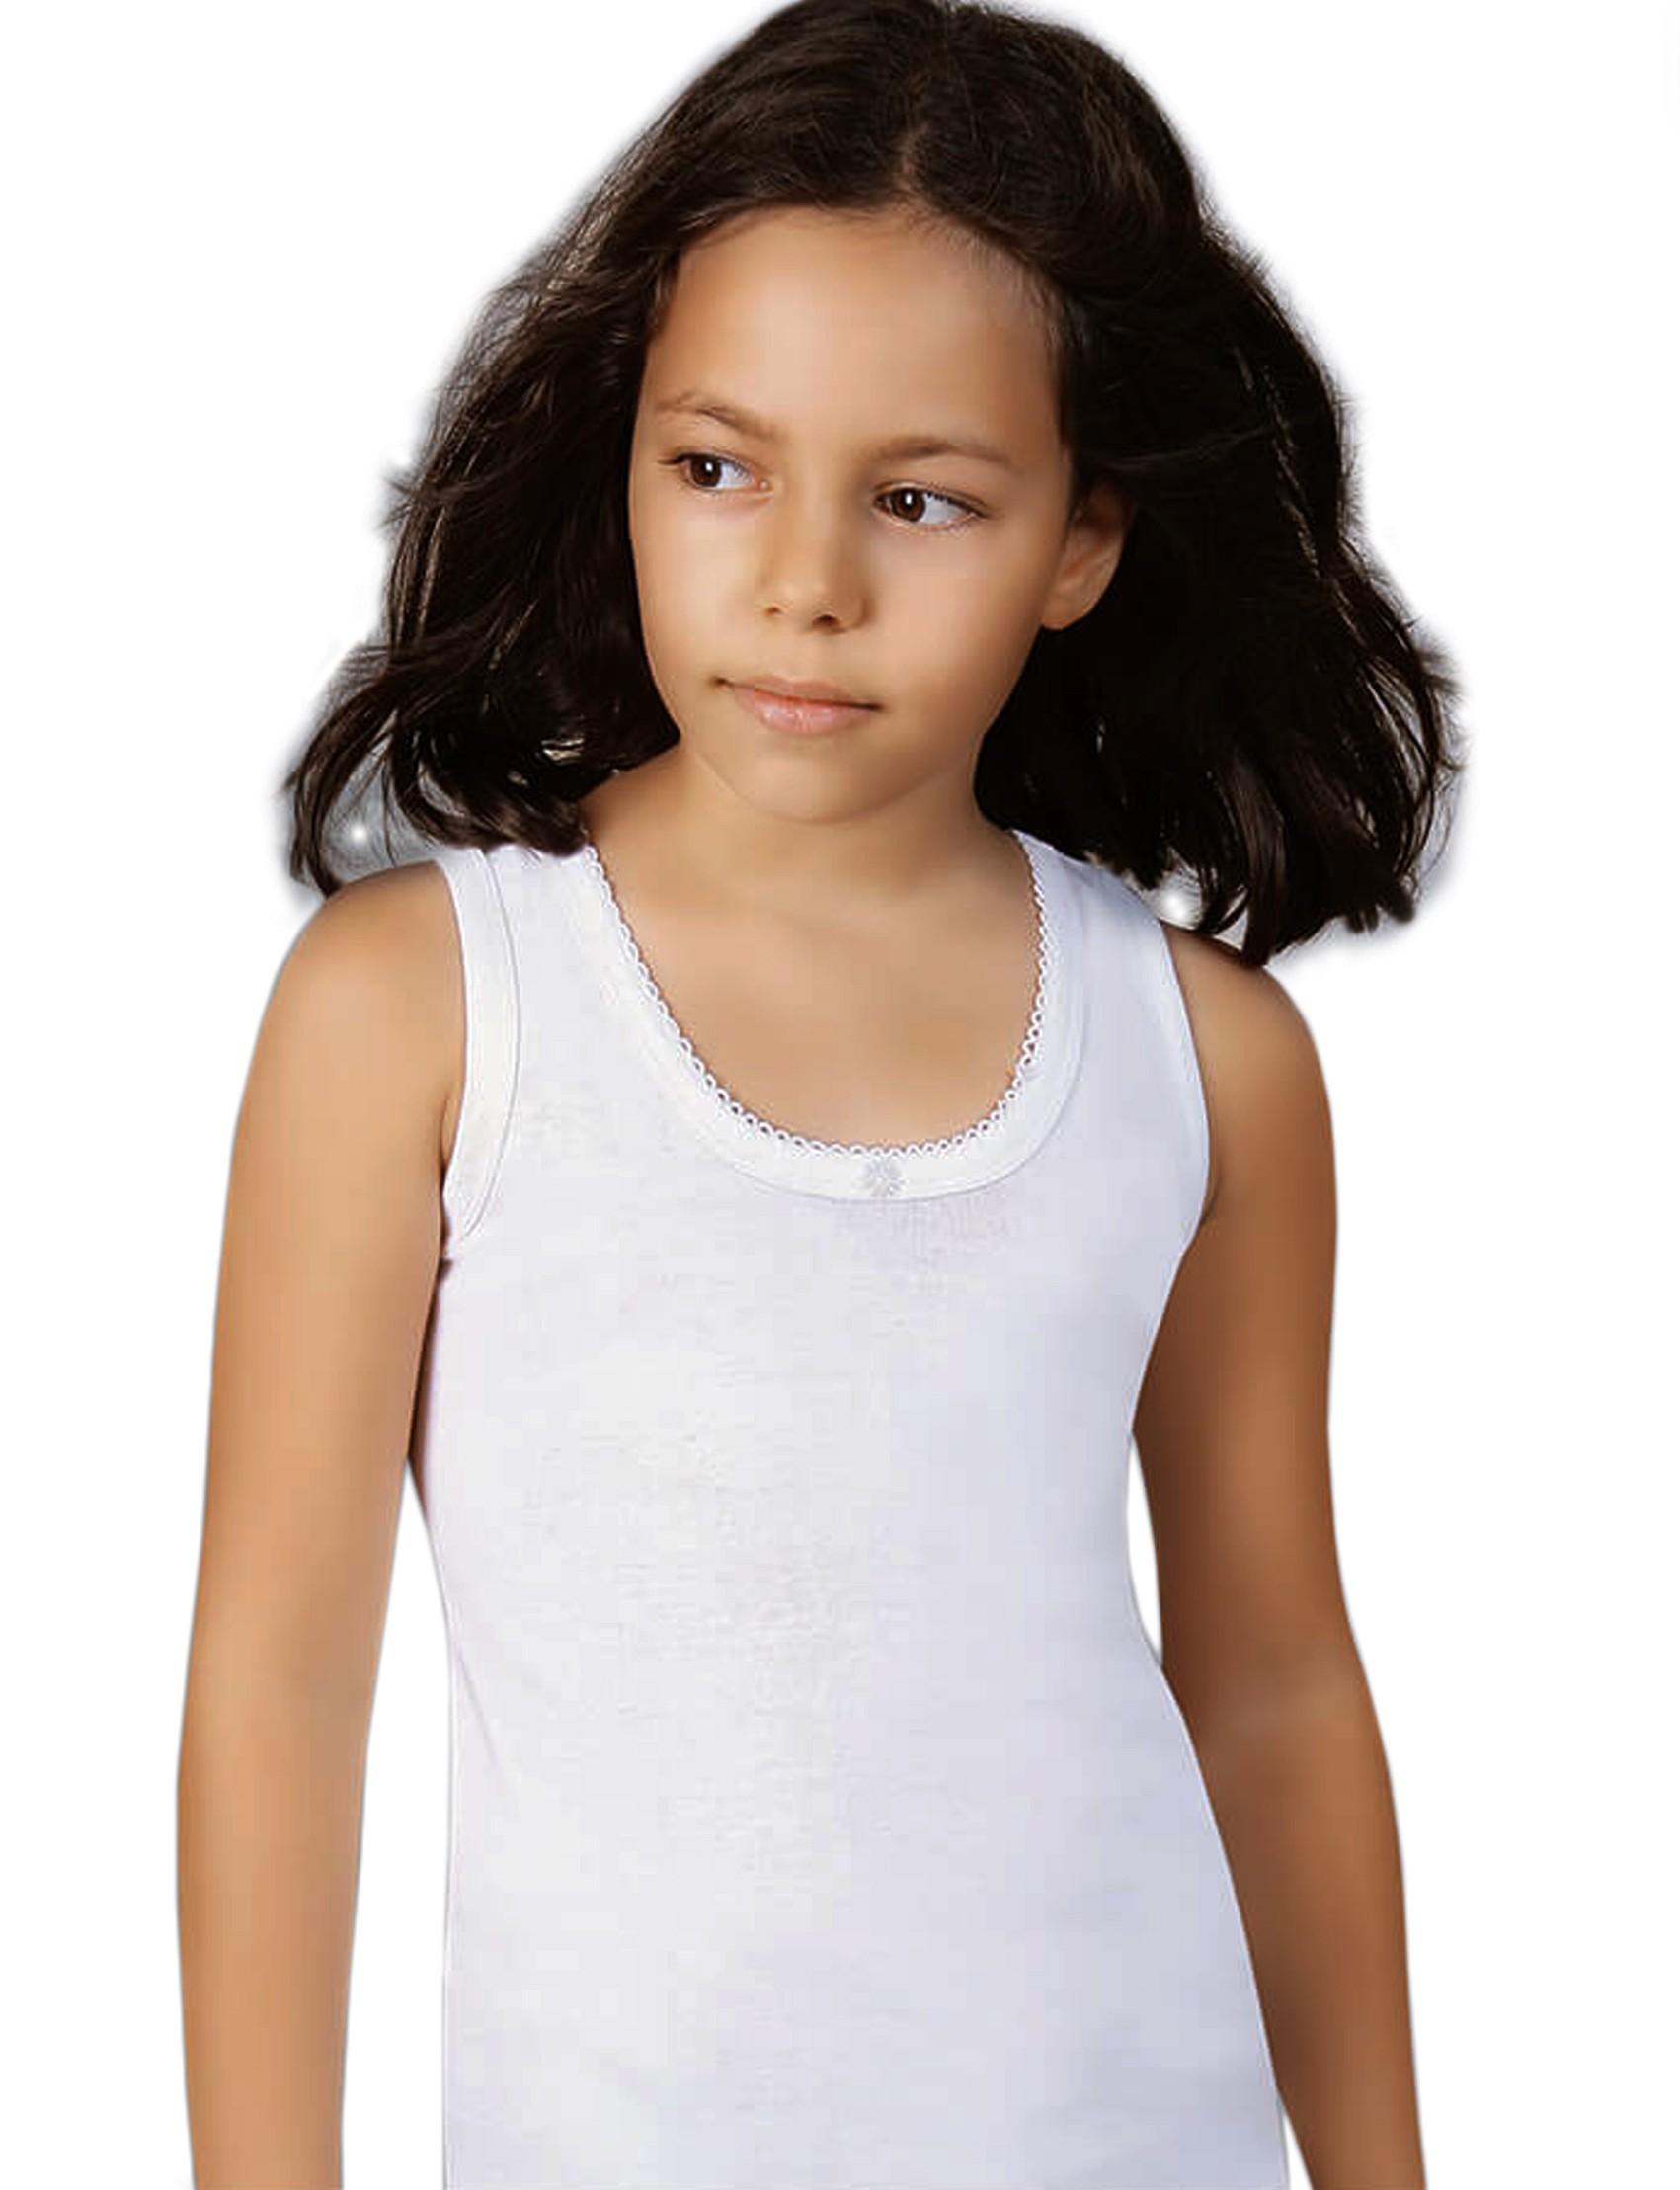 06916d04862 LaModa Λευκό φανελάκι φαρδιά τιράντα βαμβακερό για κορίτσια ΛΕΥΚΟ